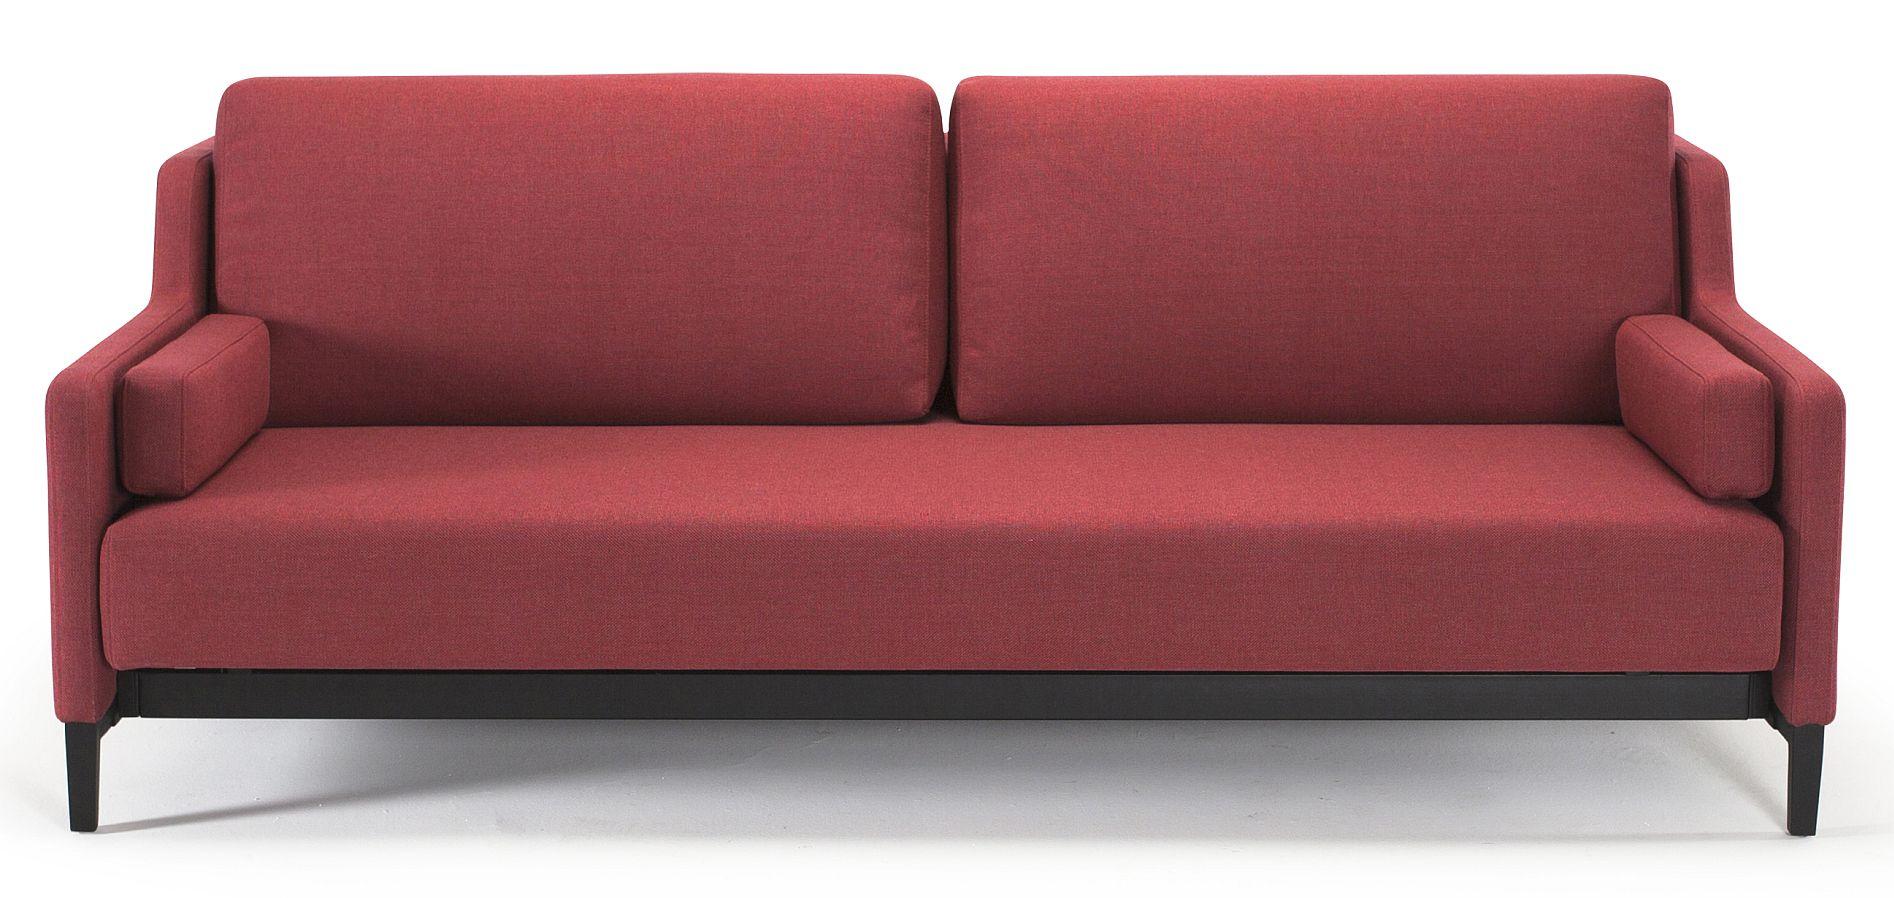 Innovation Slaapbank Hermod - Twist Rust Red 561